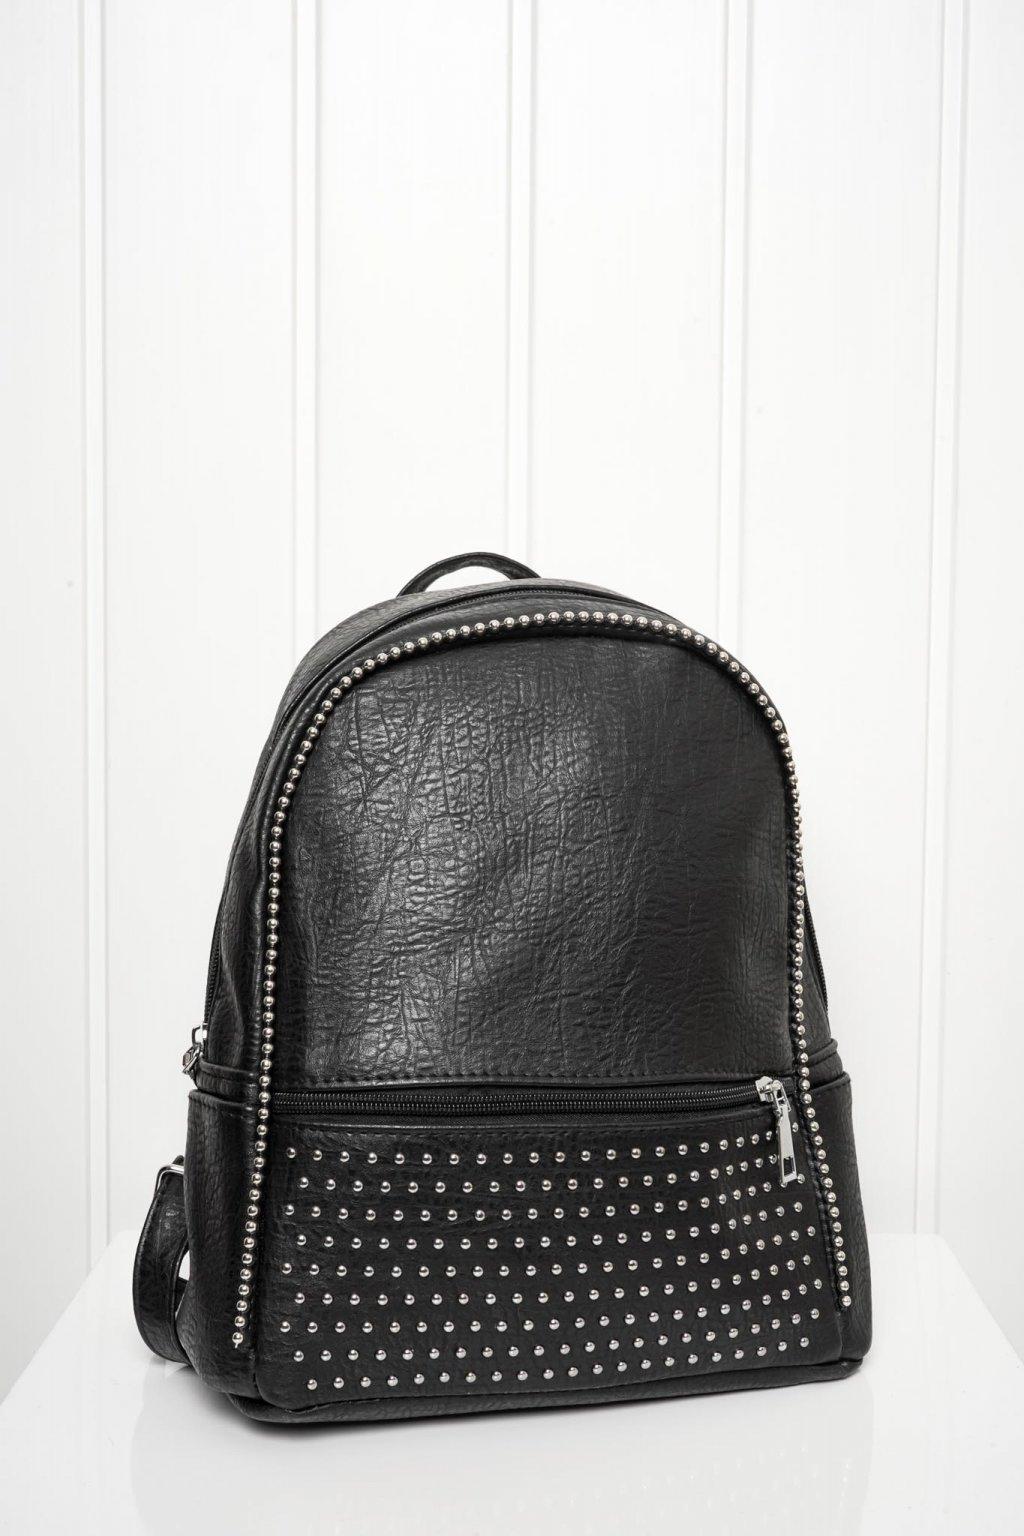 Kabelka, crossbody, ruksak, shopping bag, shopperka, 358